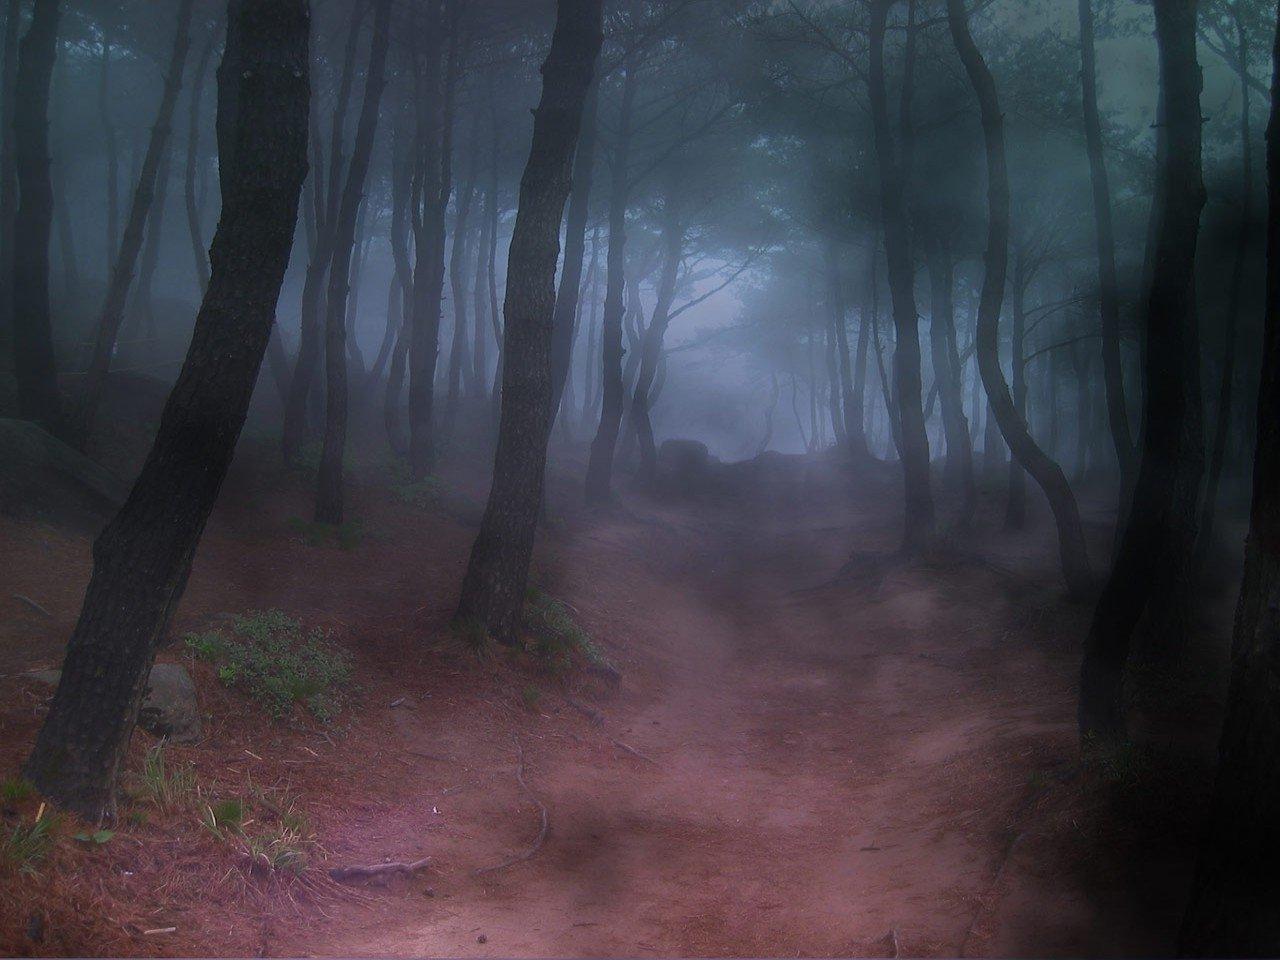 FOREST FOG 1280x960